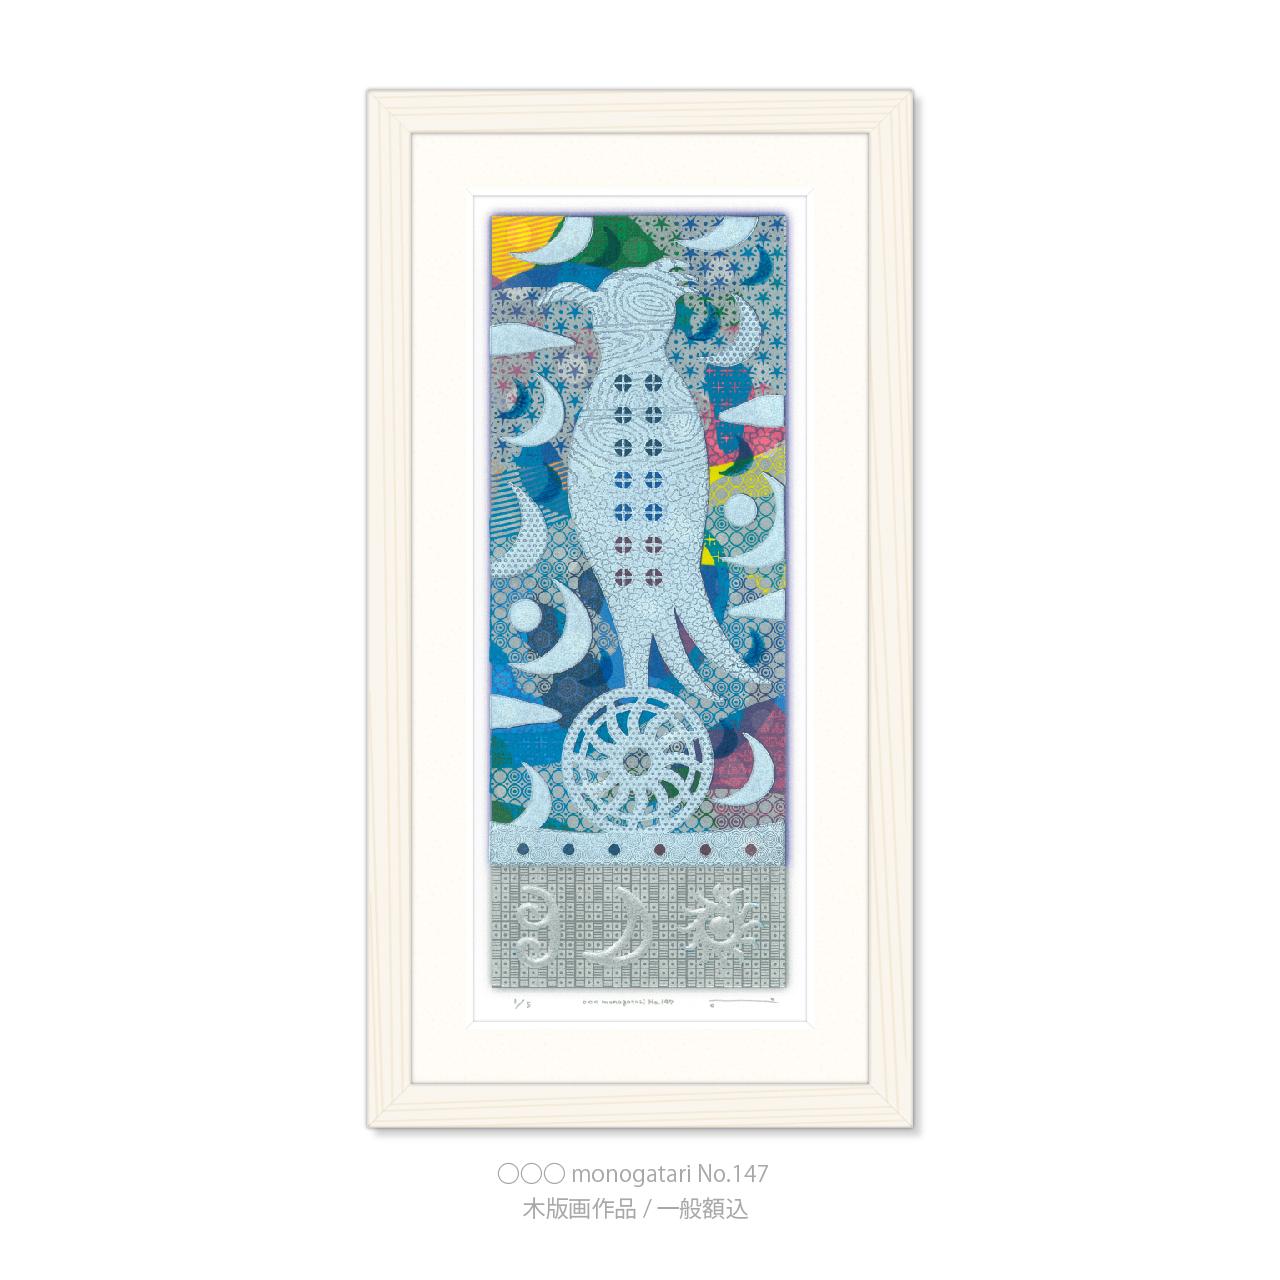 ○○○ monogatari No.147